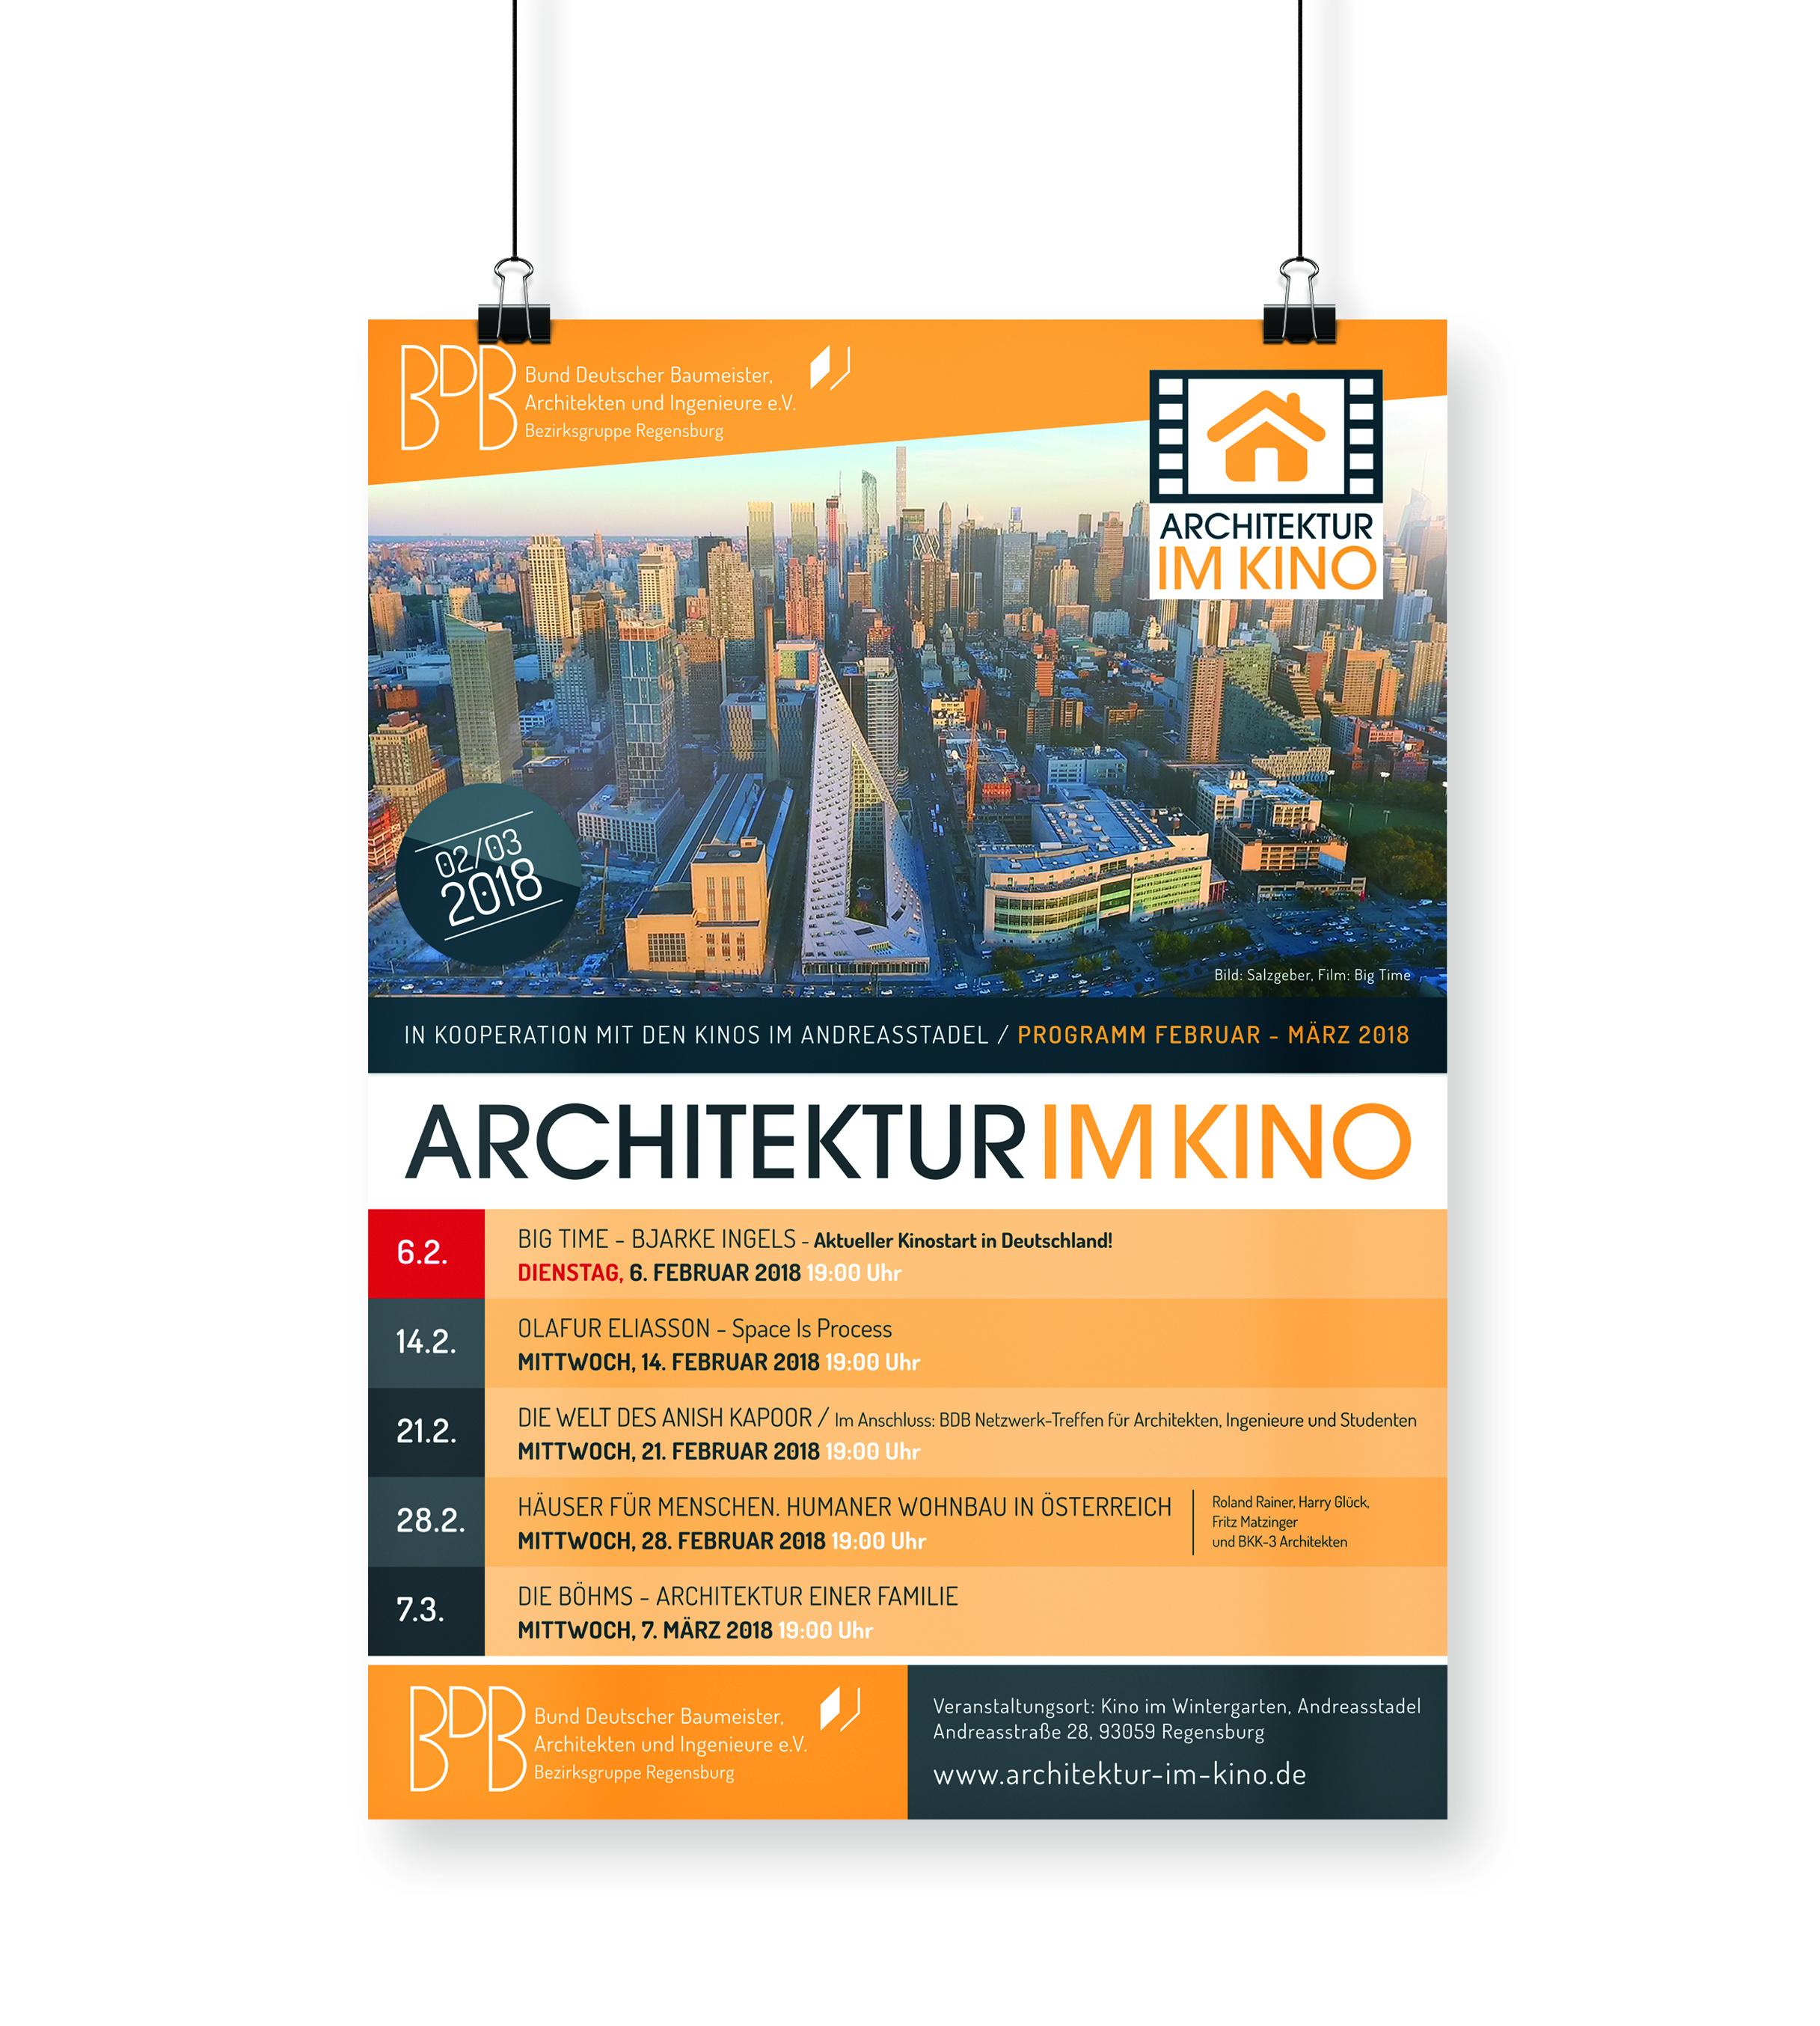 Architketur_im_Kino_Plakat_hell